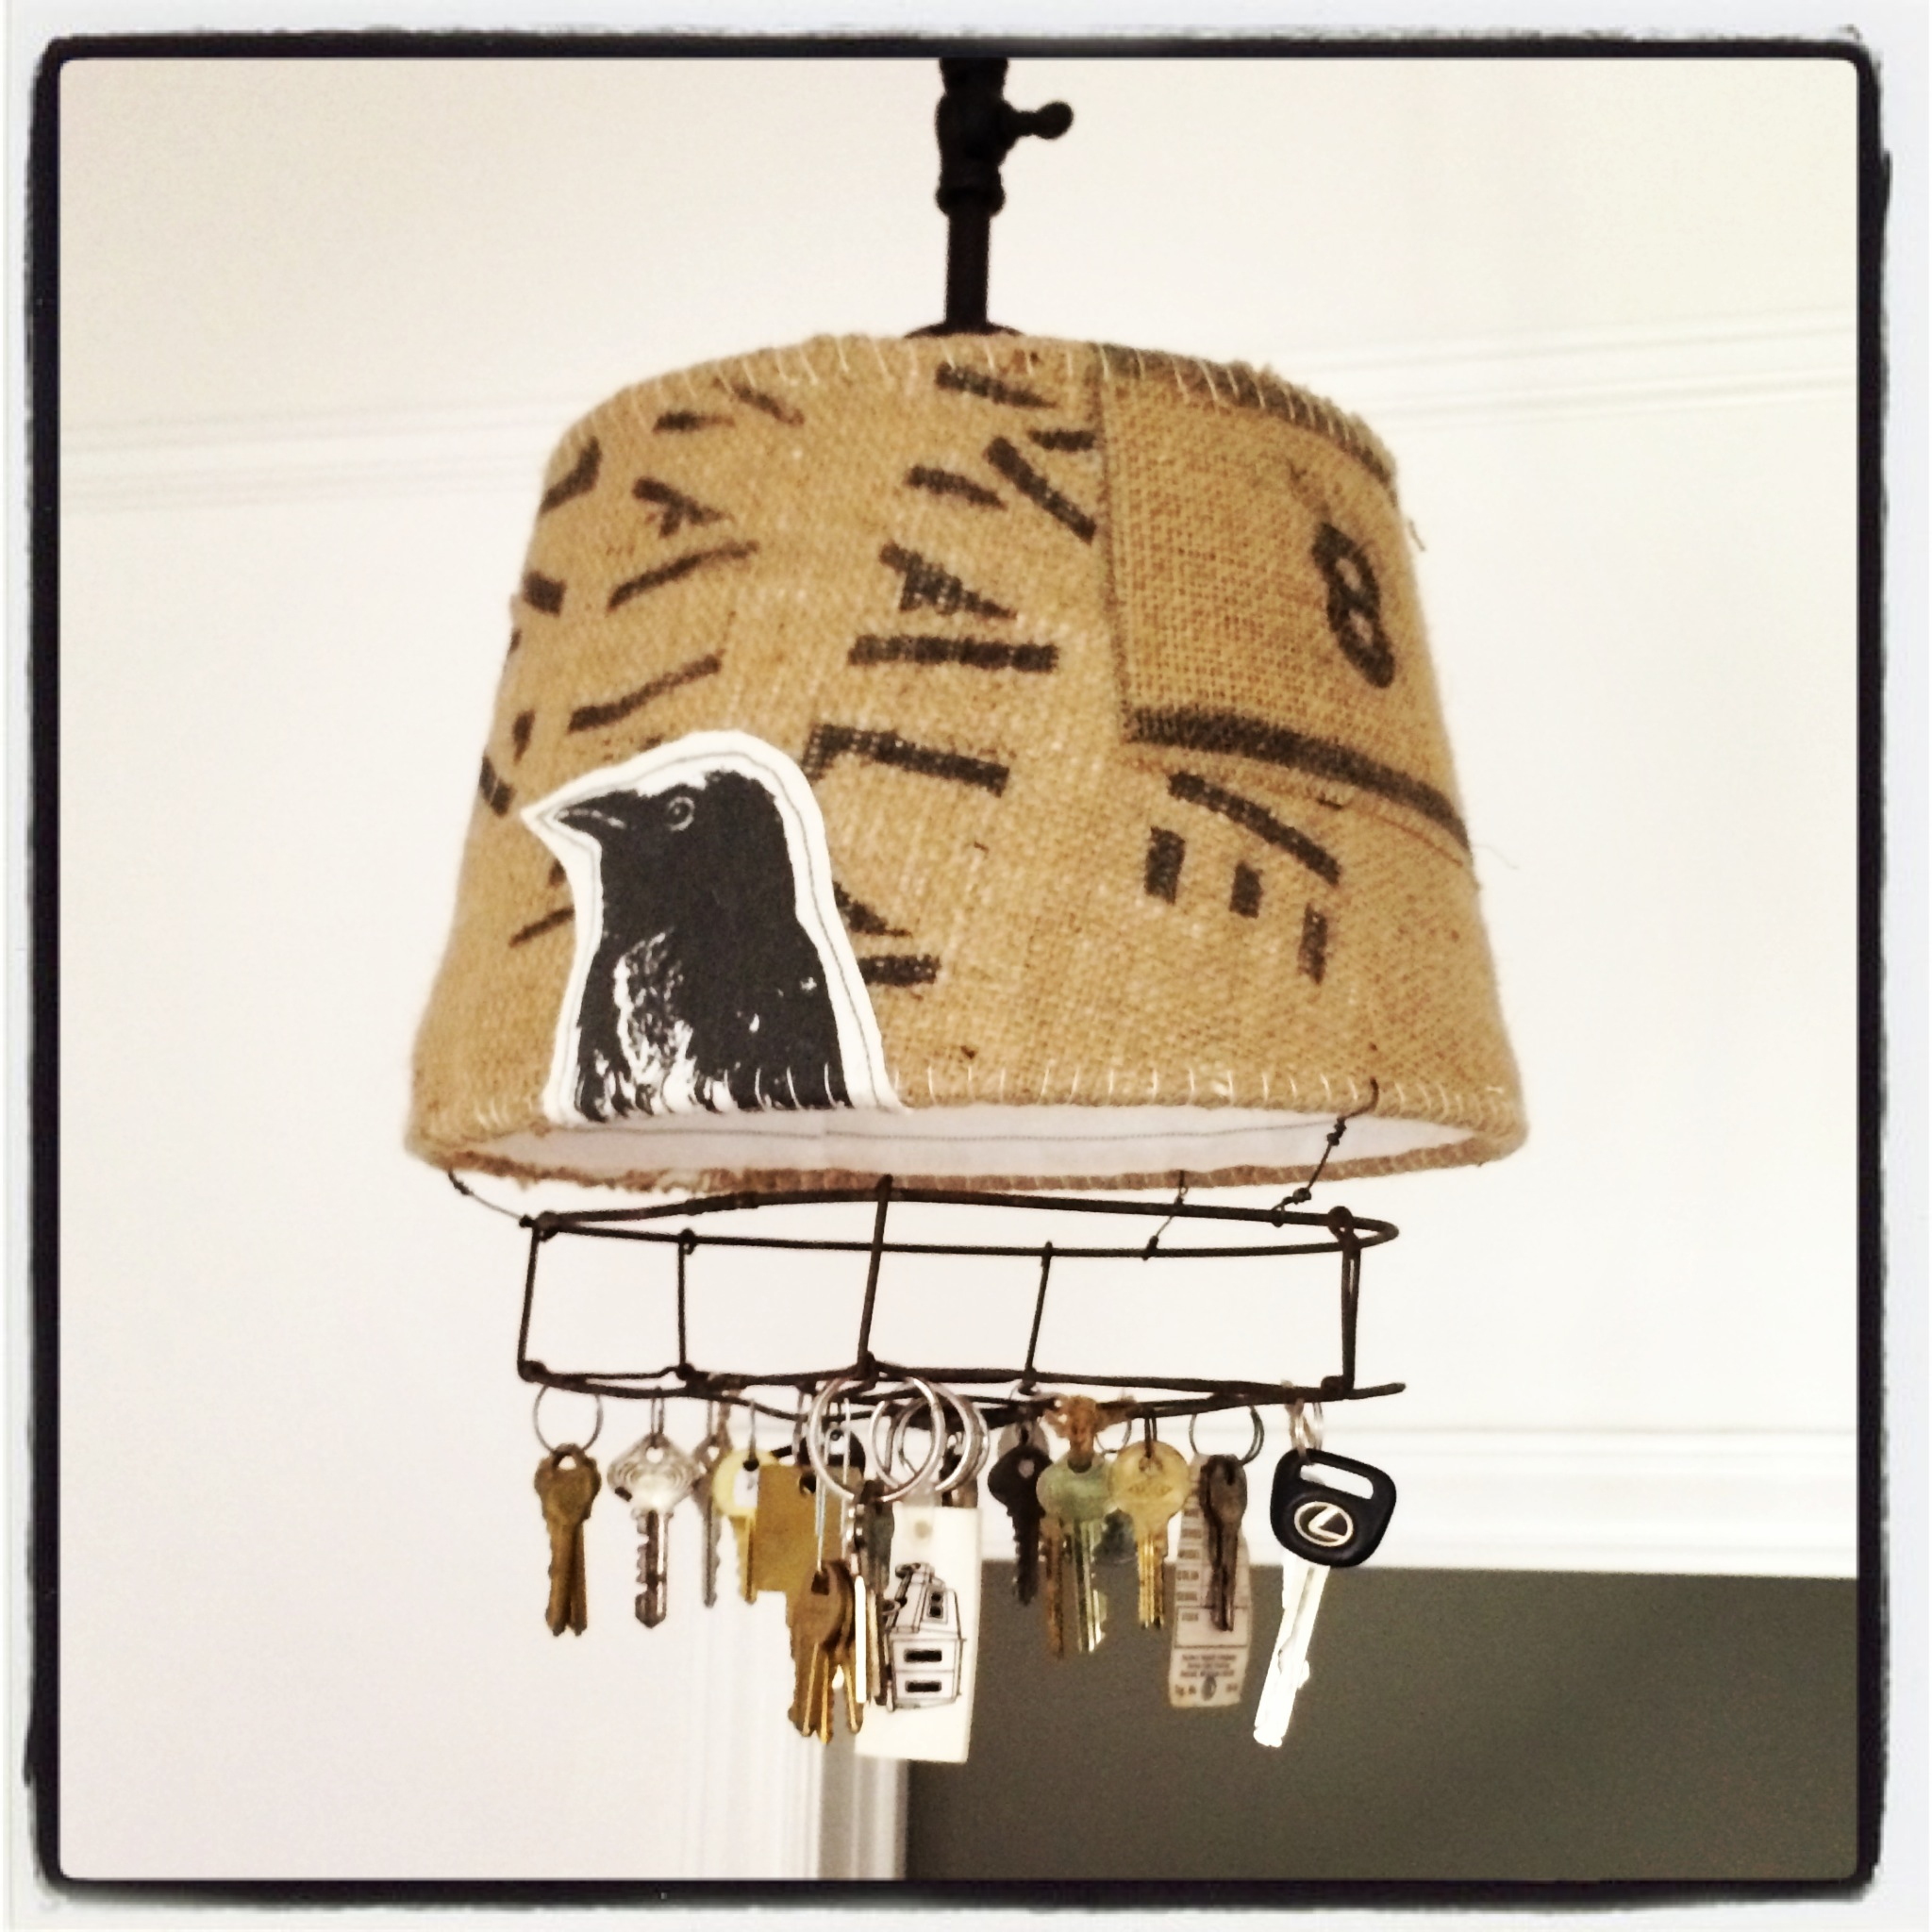 Coffee Sack, GE Fan, Old Keys and Original Artwork printed onto fabric